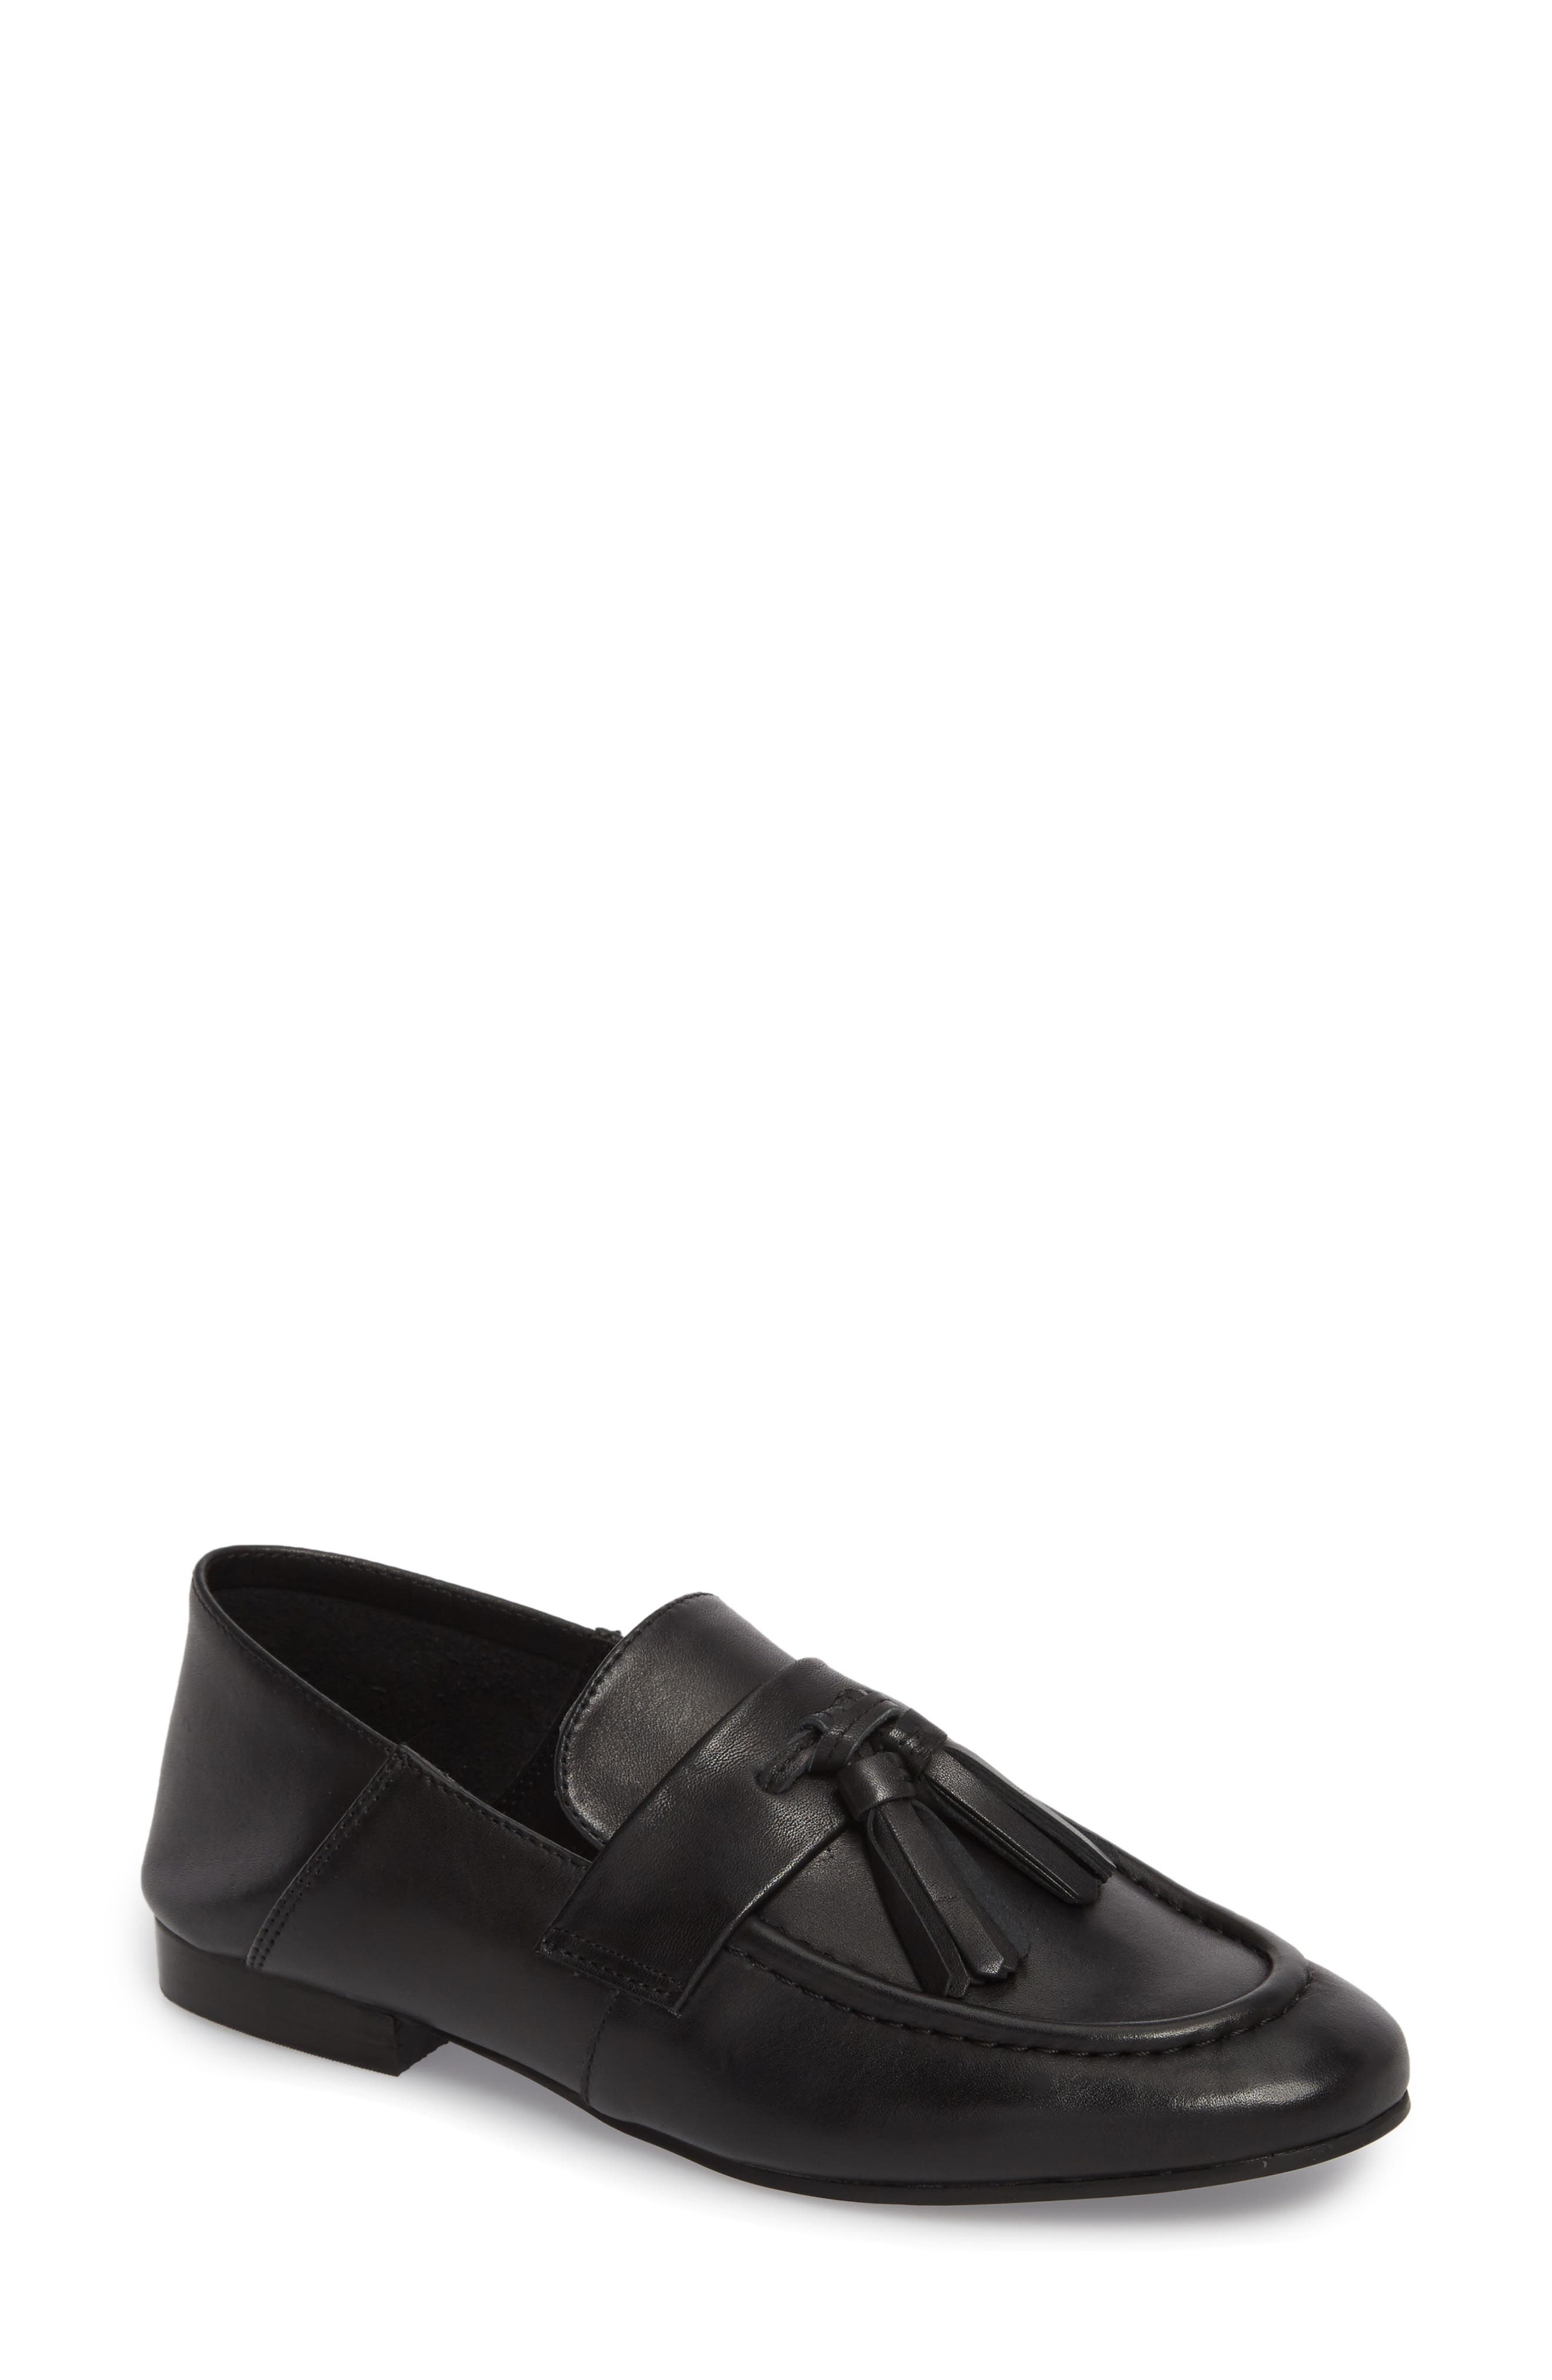 Beck Convertible Tasseled Loafer,                         Main,                         color,